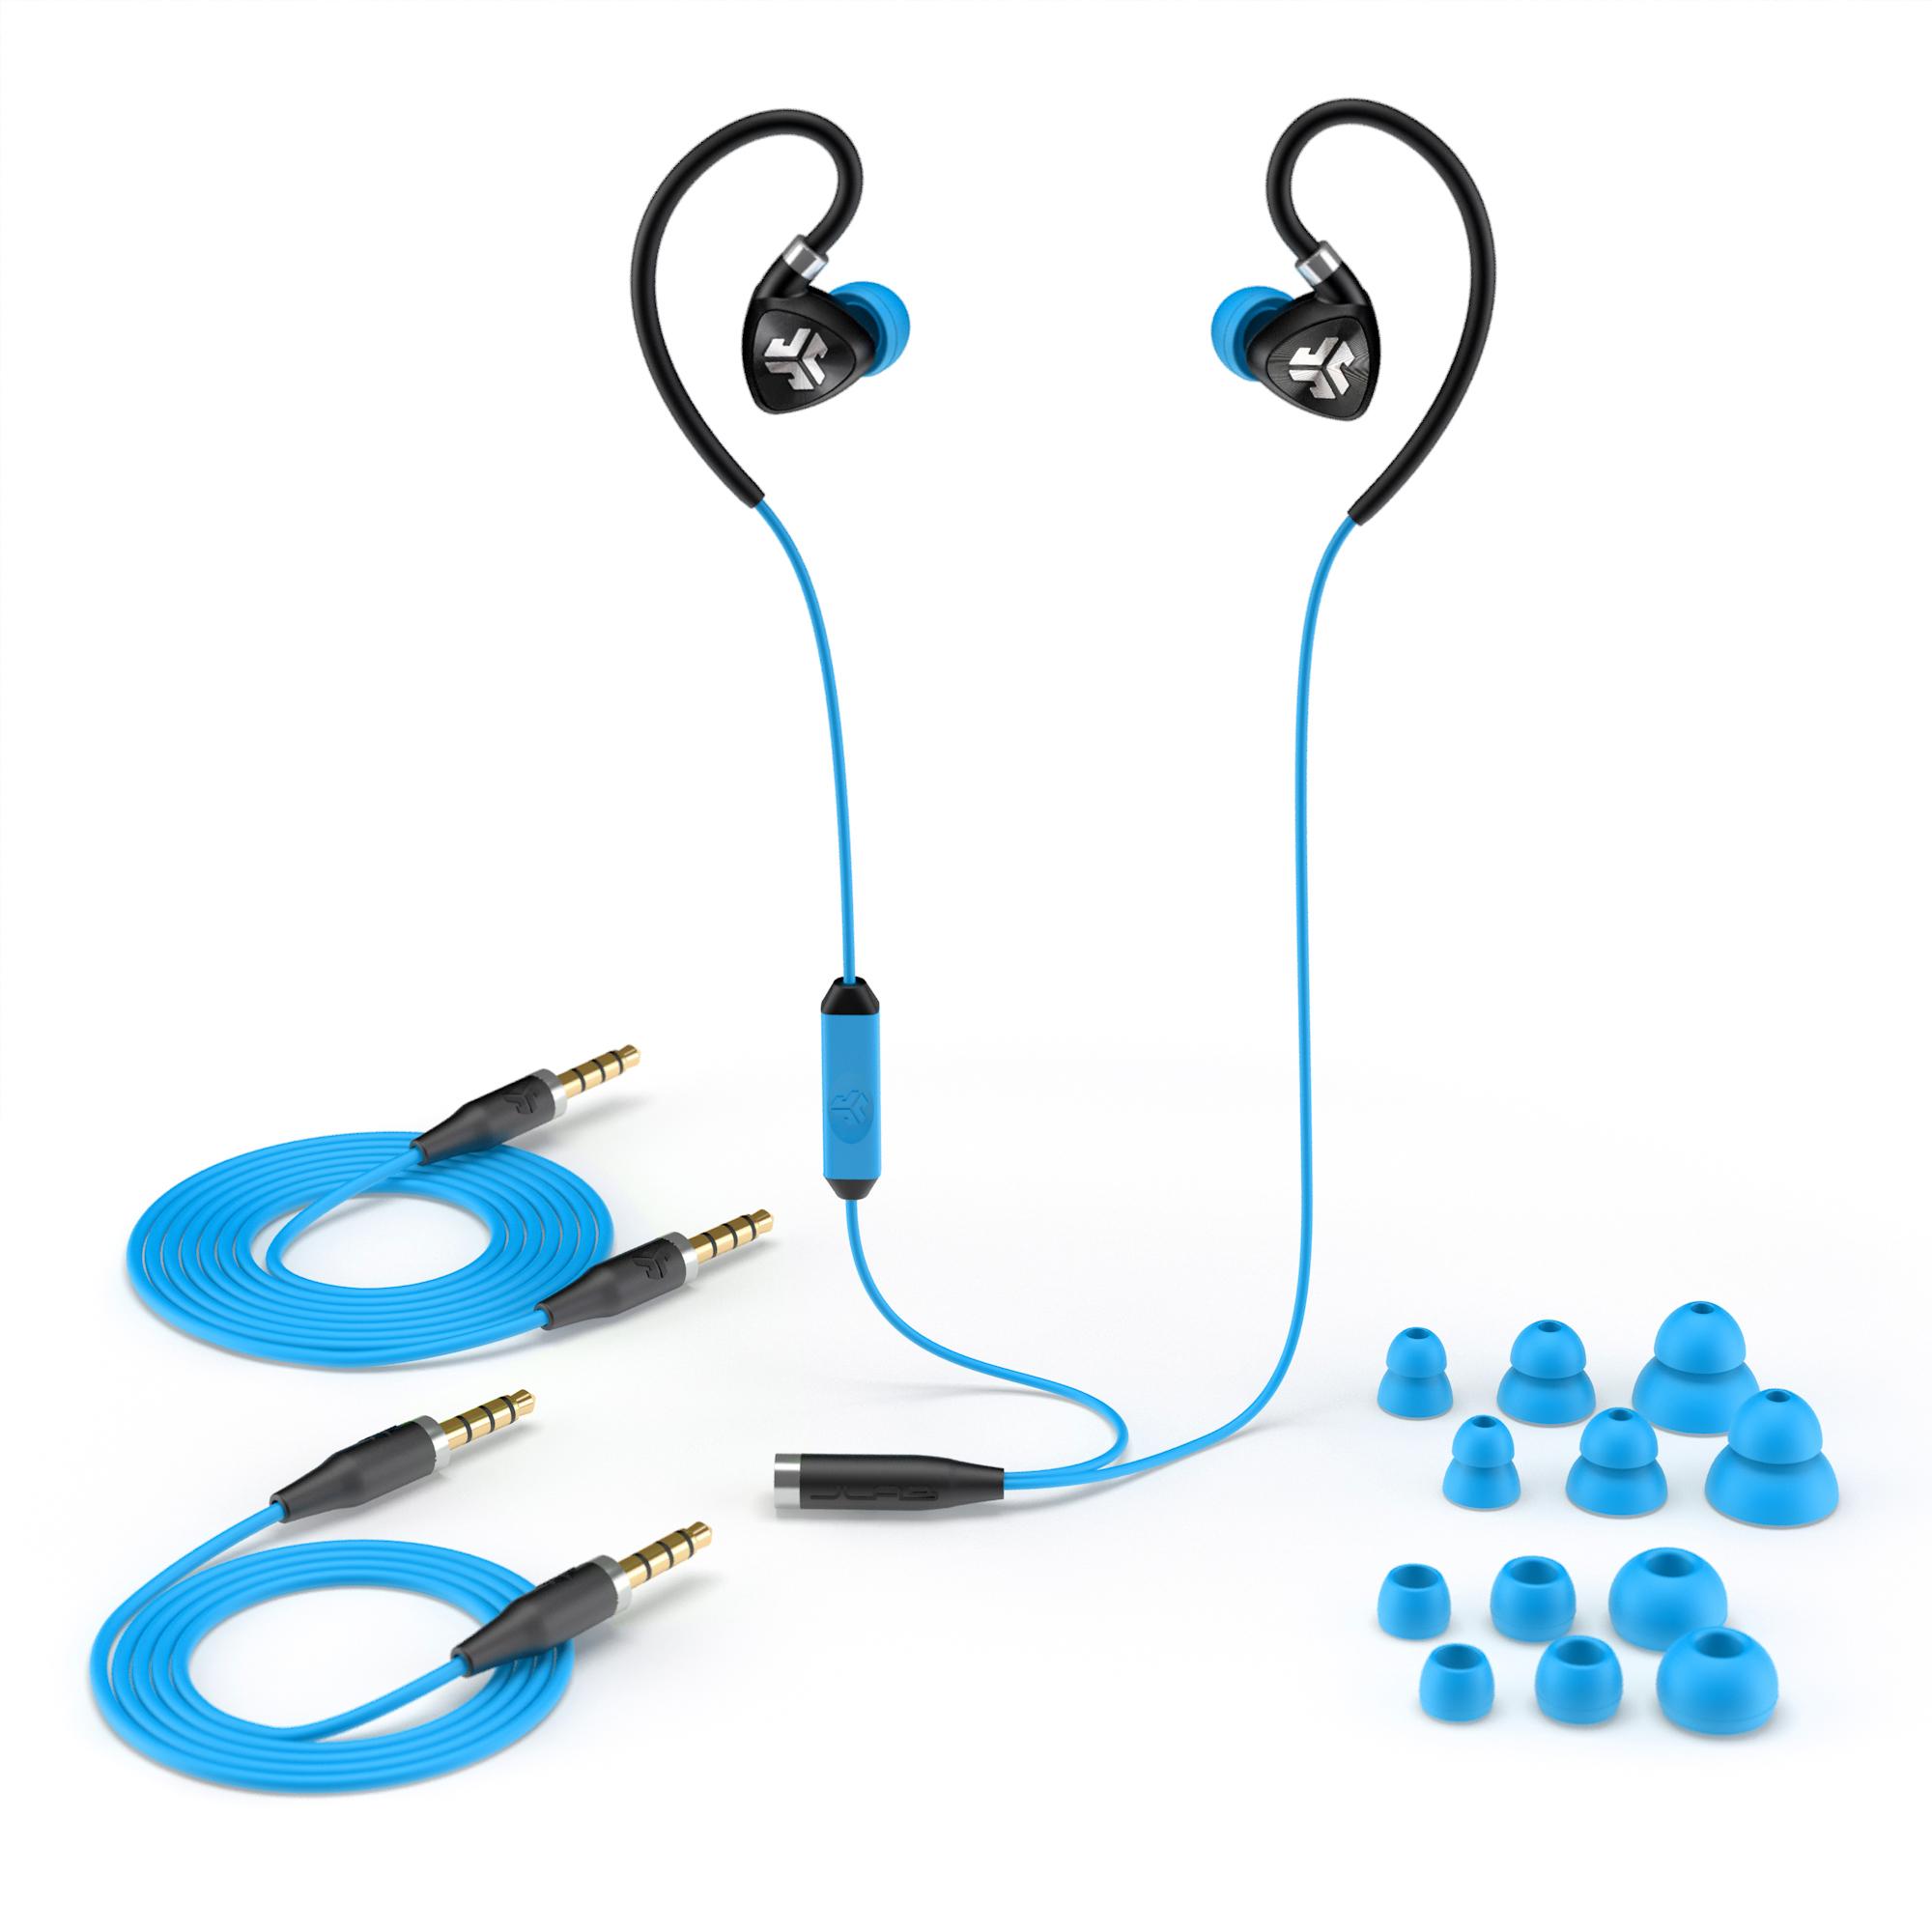 Jlab earbuds fit 2.0 - cheap beats earbuds